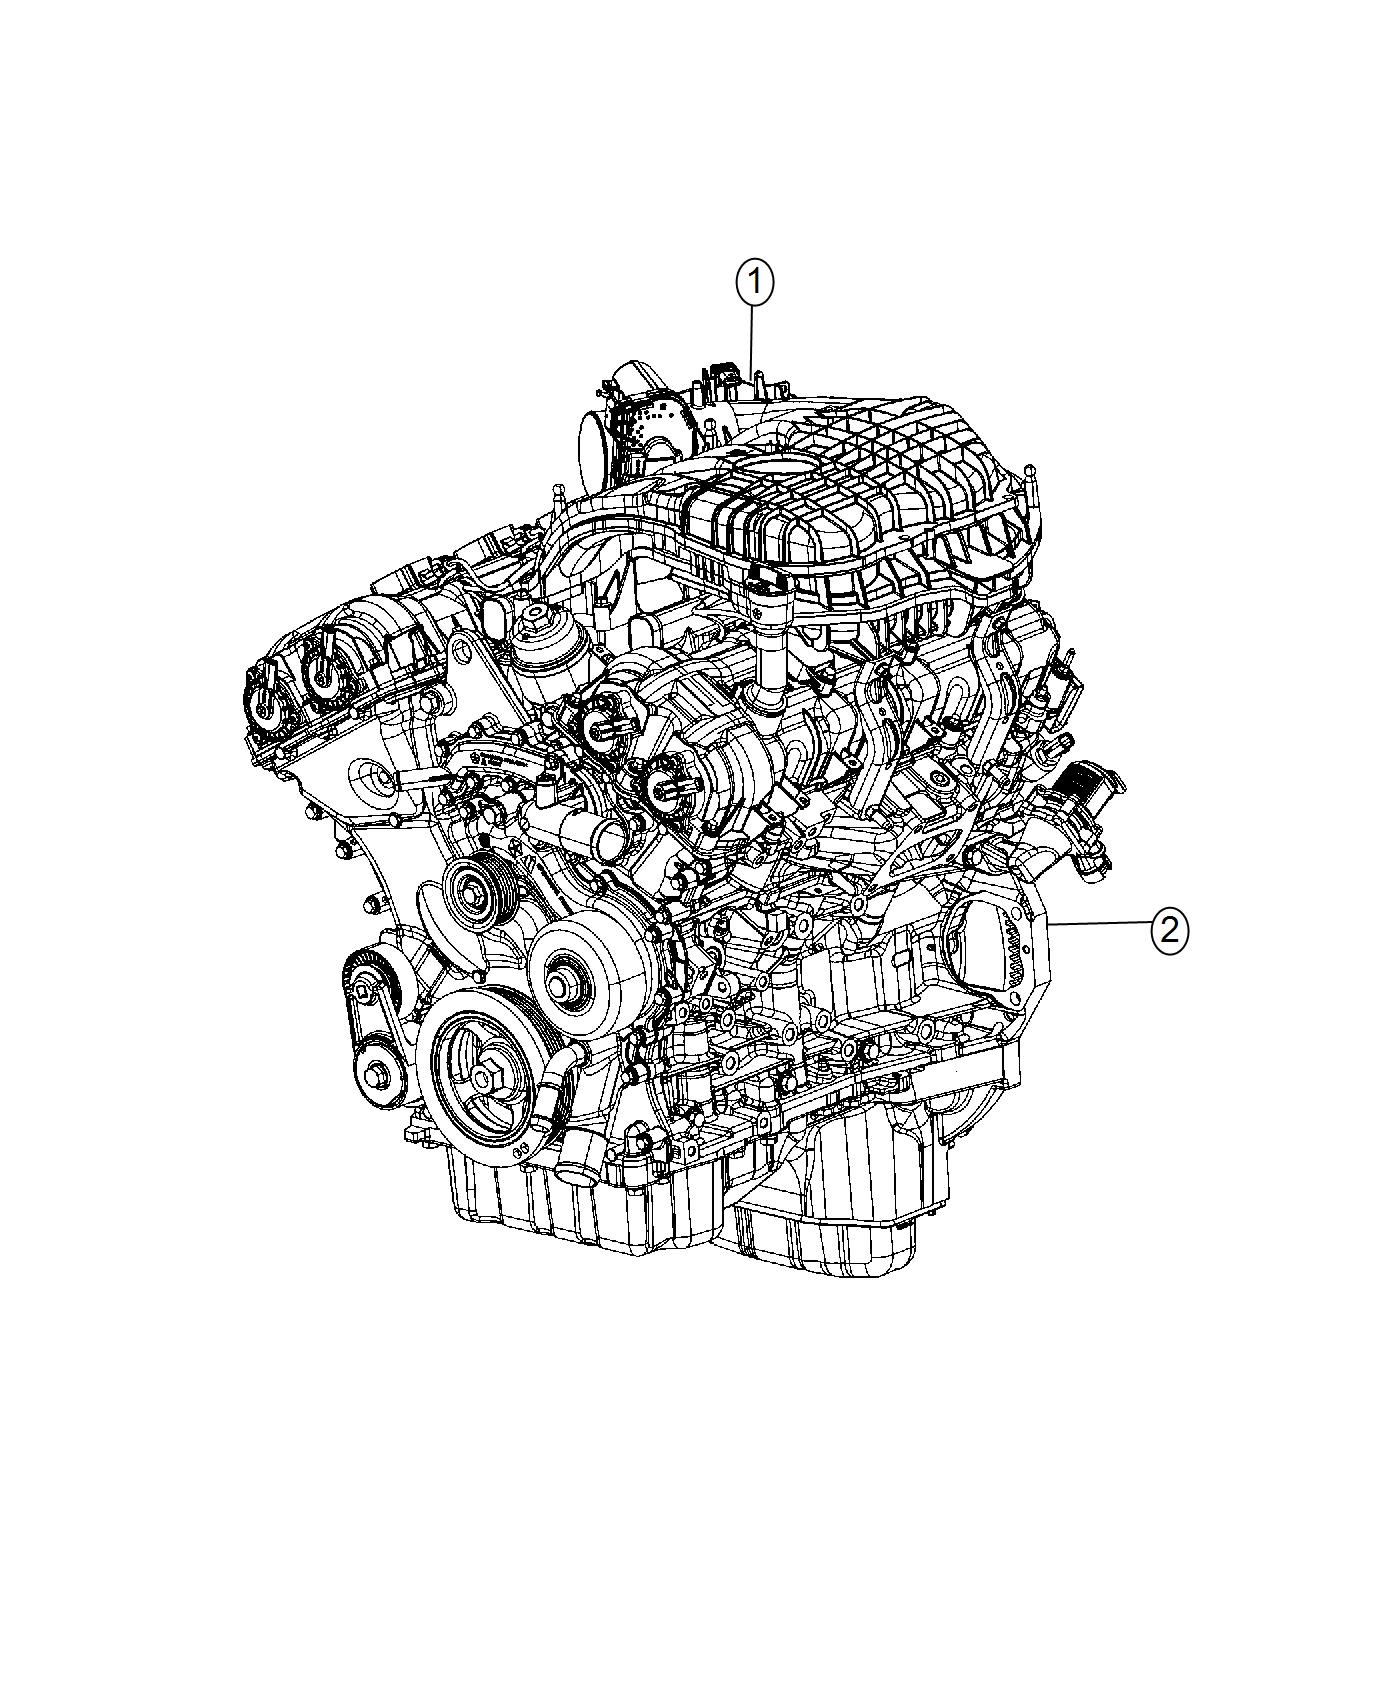 Jeep Wrangler Engine Long Block